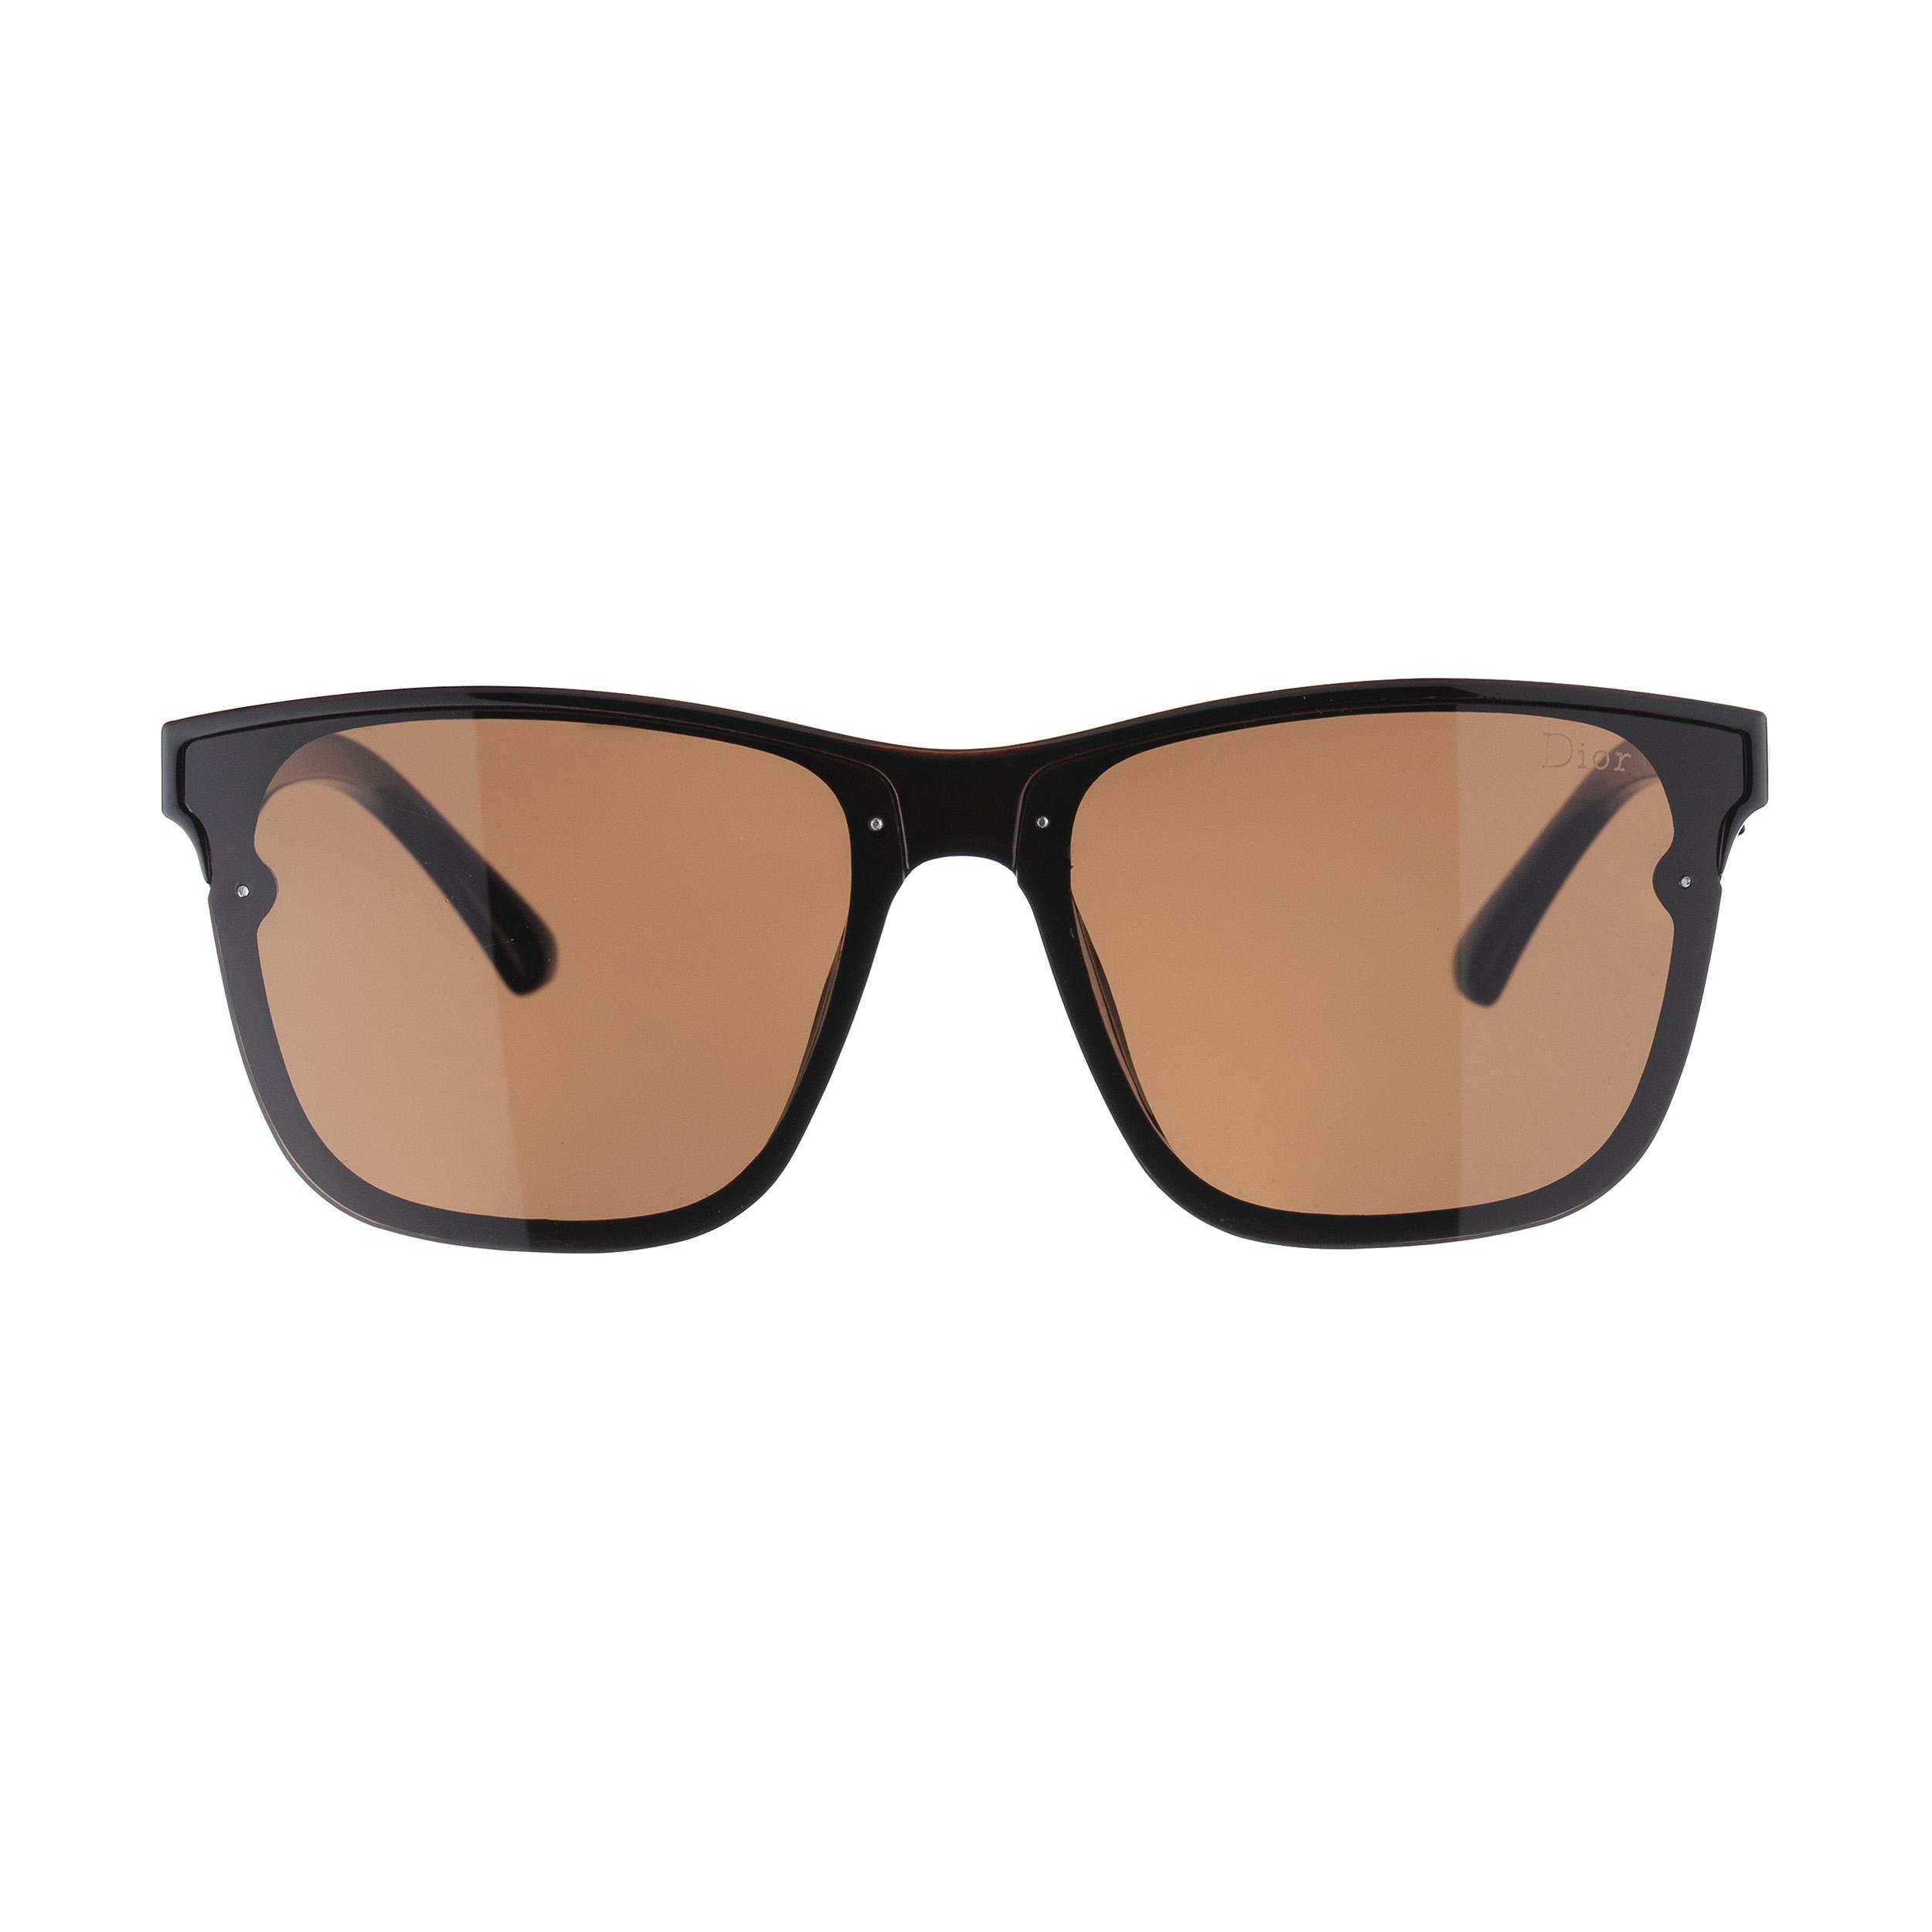 عینک آفتابی زنانه کد 1836                     غیر اصل